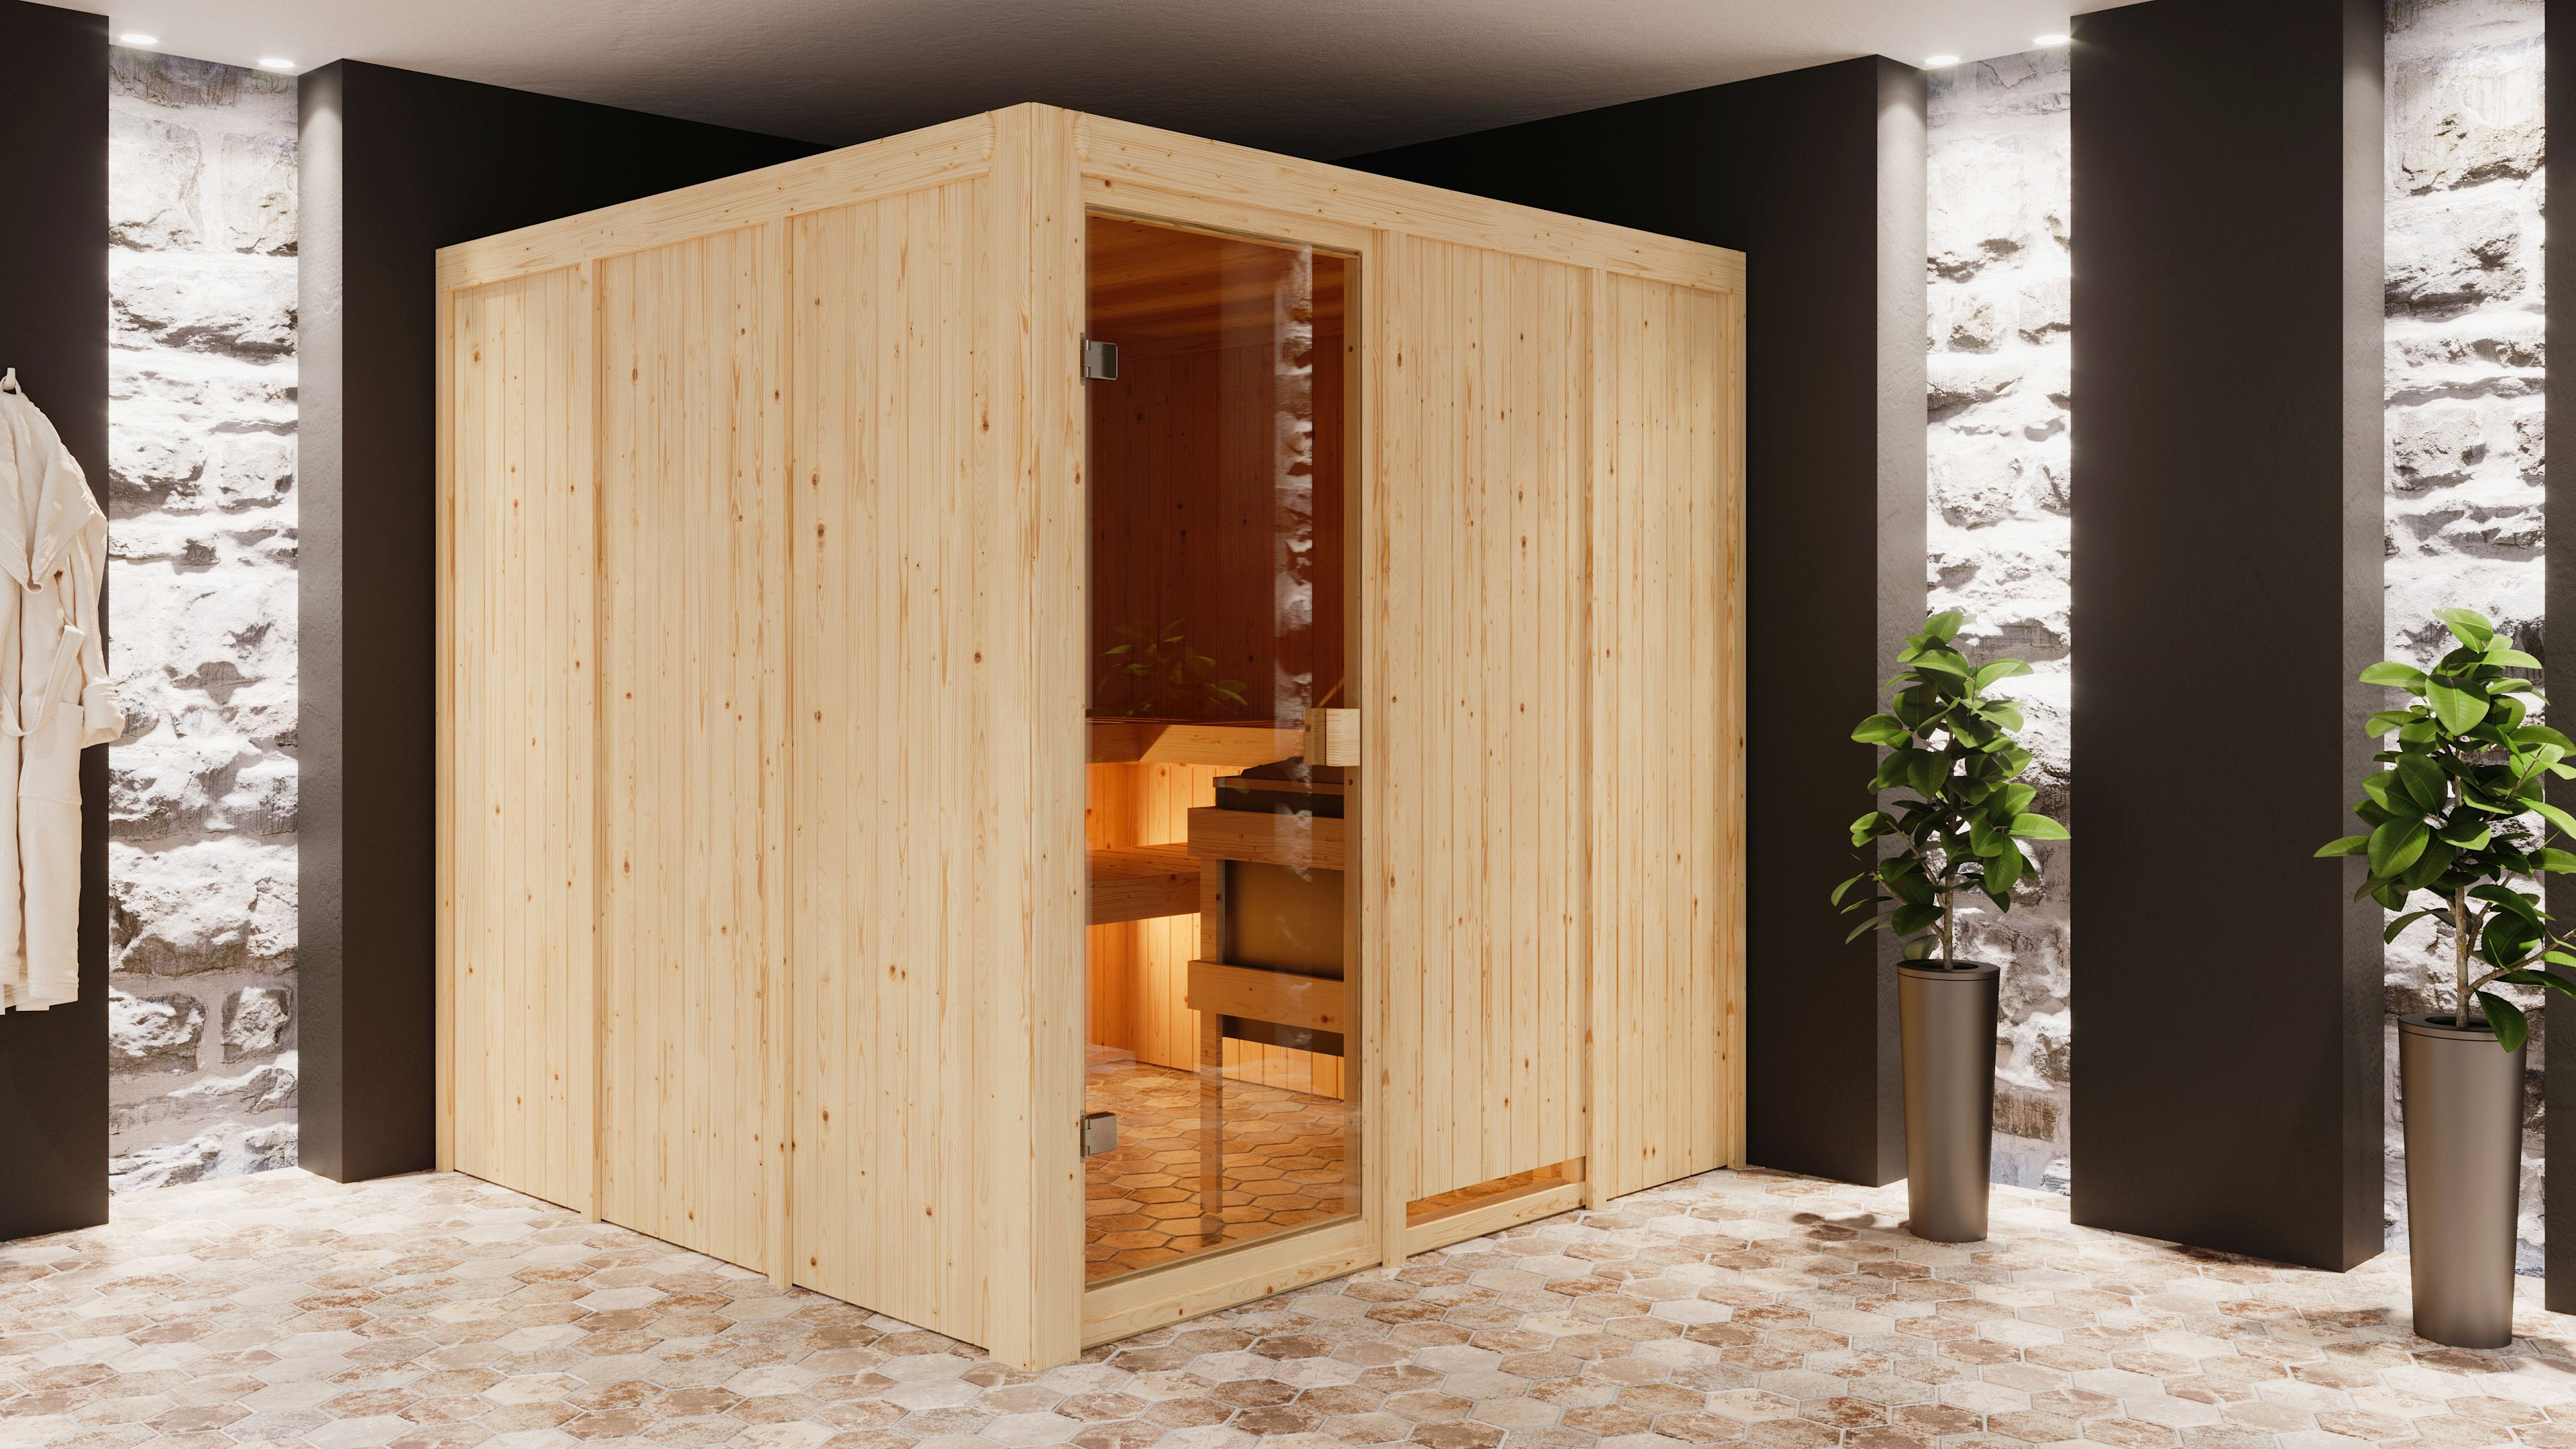 Woodfeeling Sauna Oulu 68mm ohne Saunaofen Bild 6